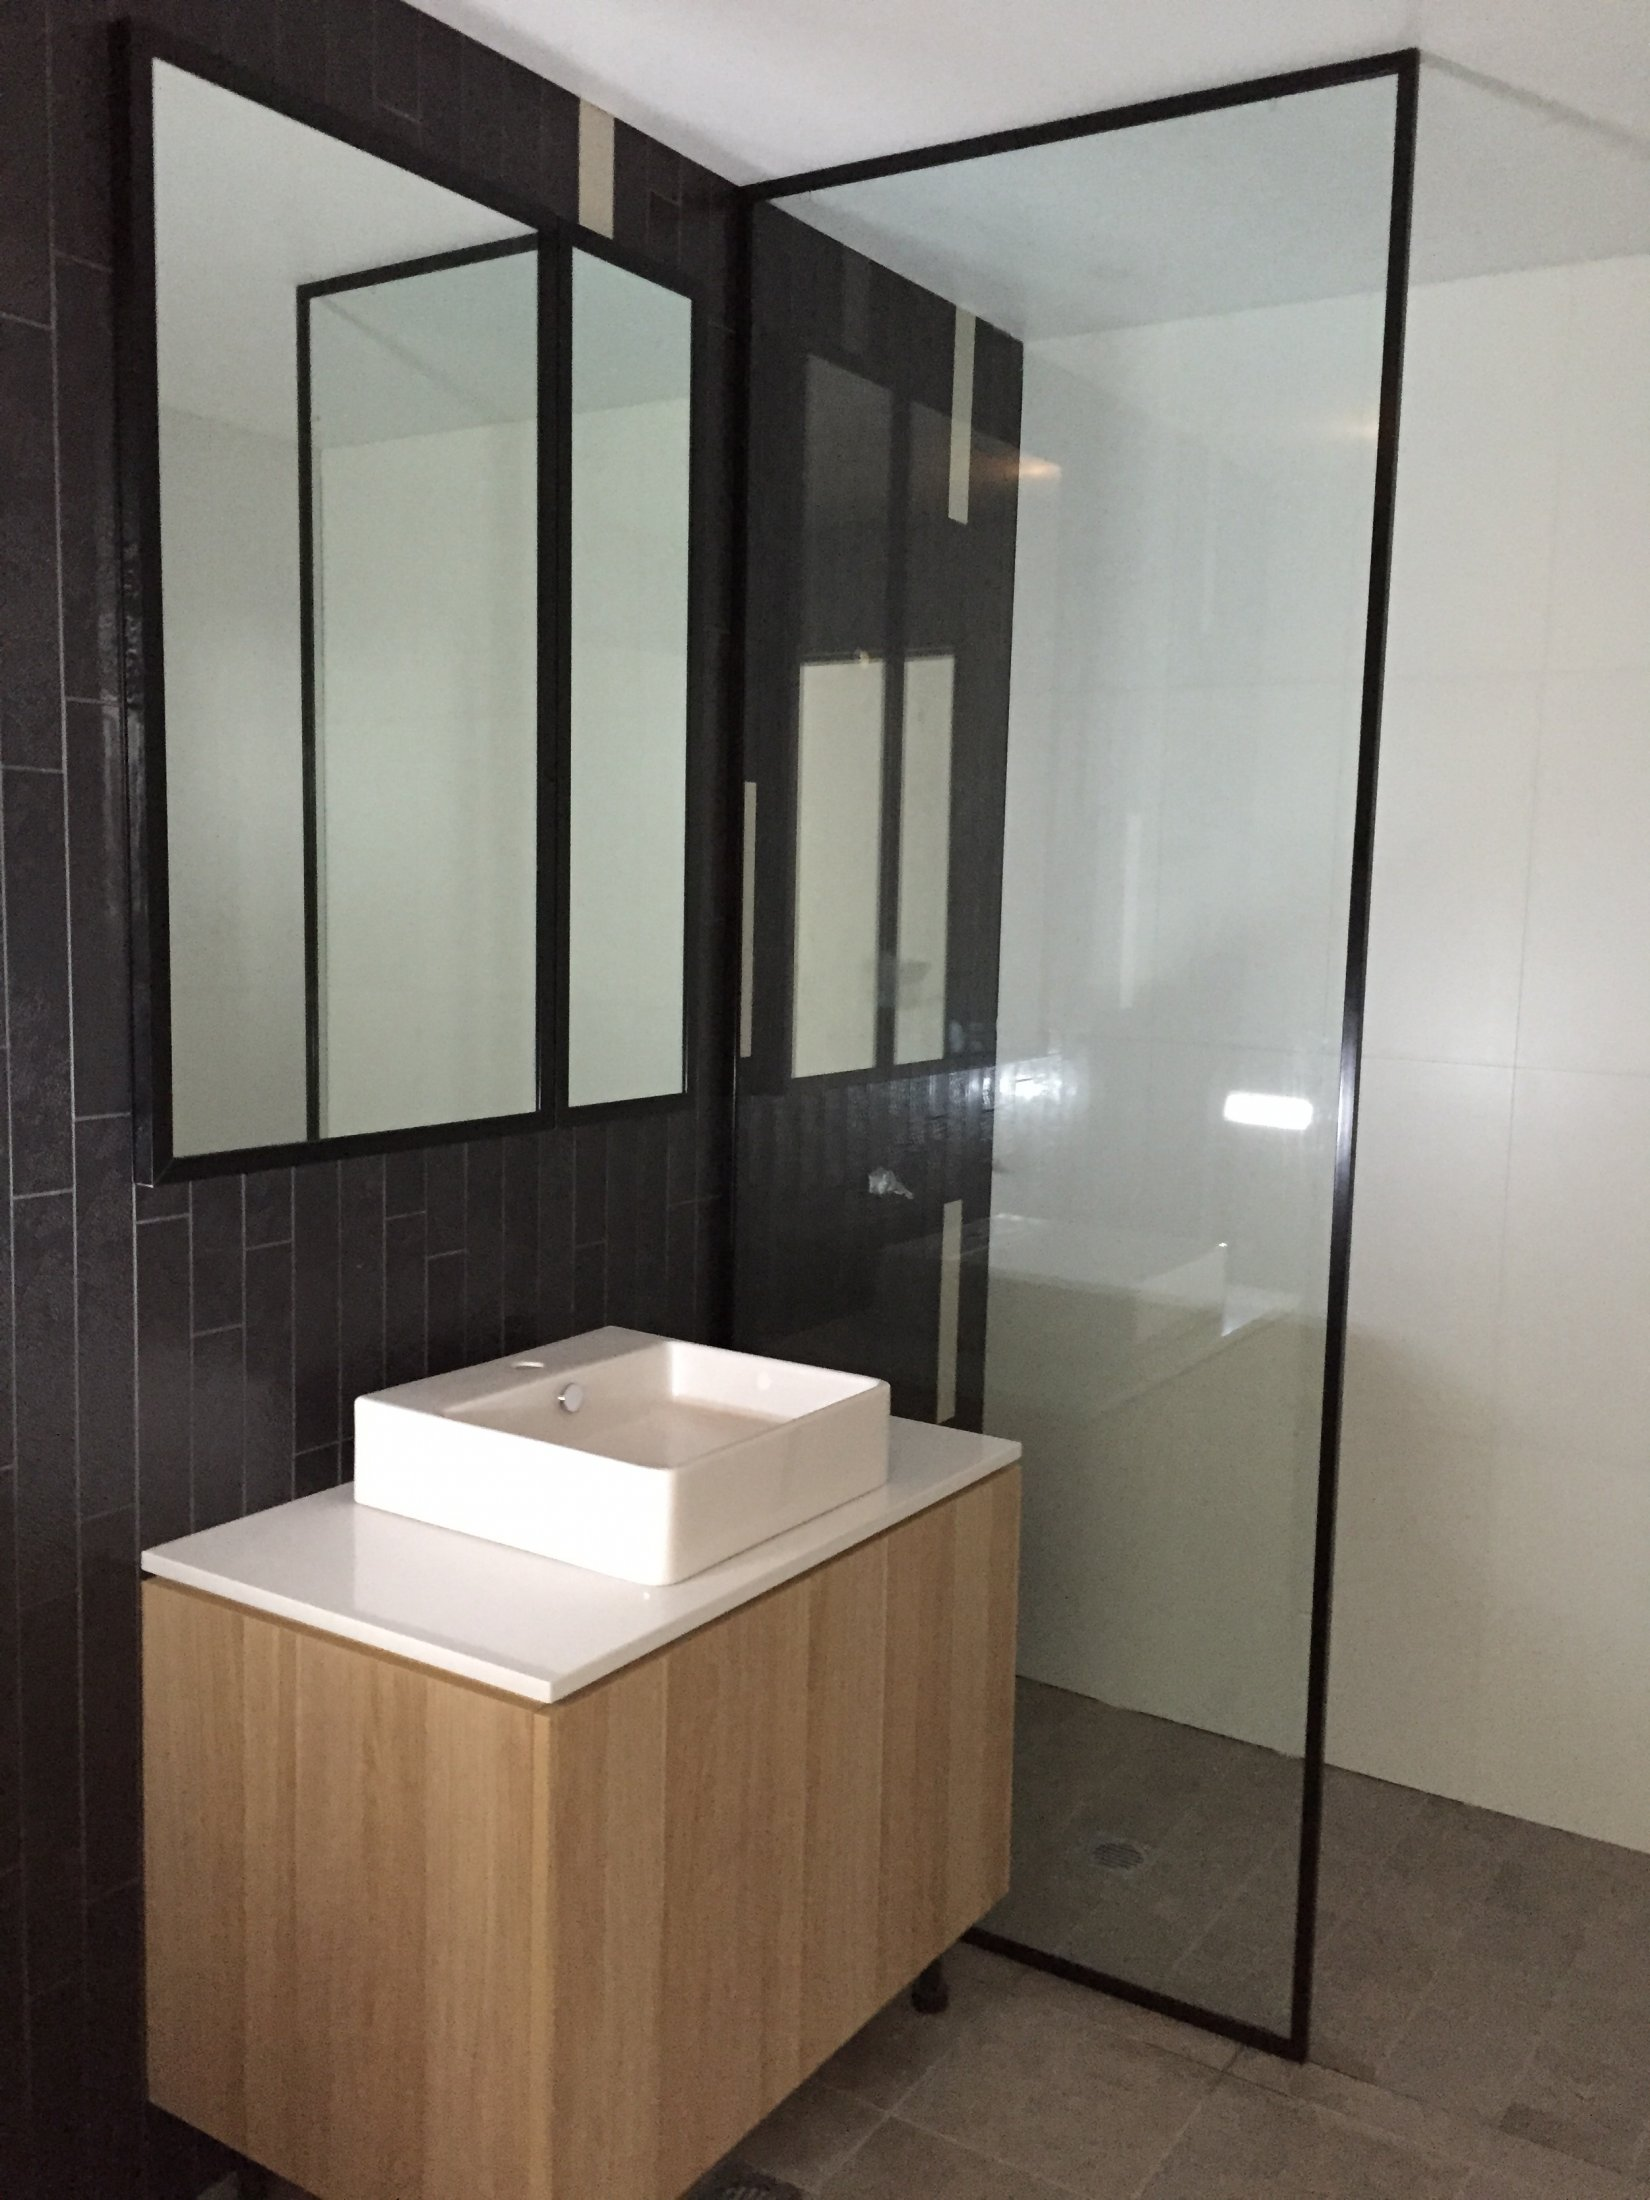 Awesome Custom Fully Framed 10mm Panel Showerscreen   Epping